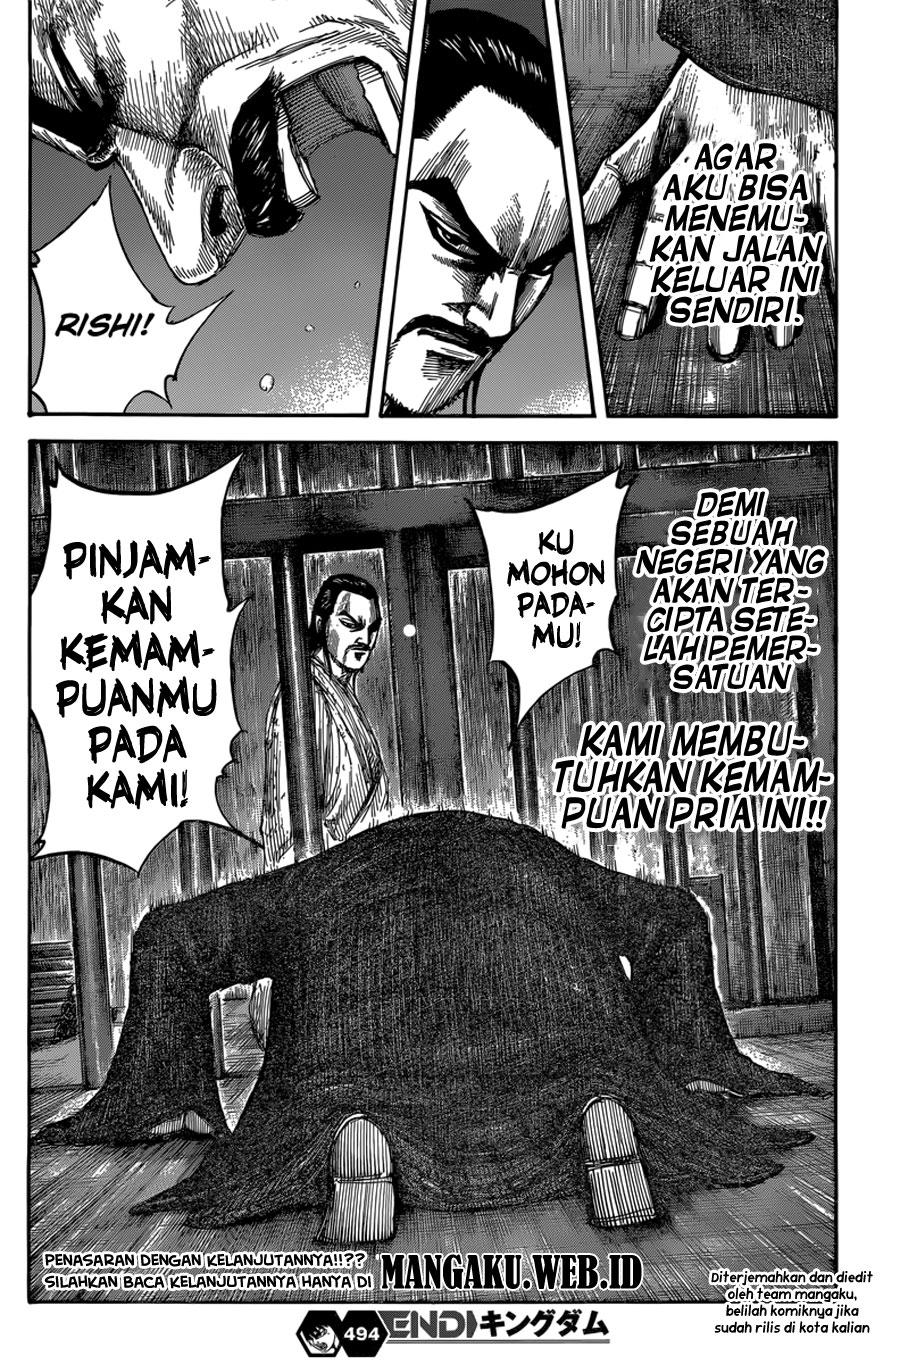 Baca Komik Manga Kingdom Chapter 494 Komik Station